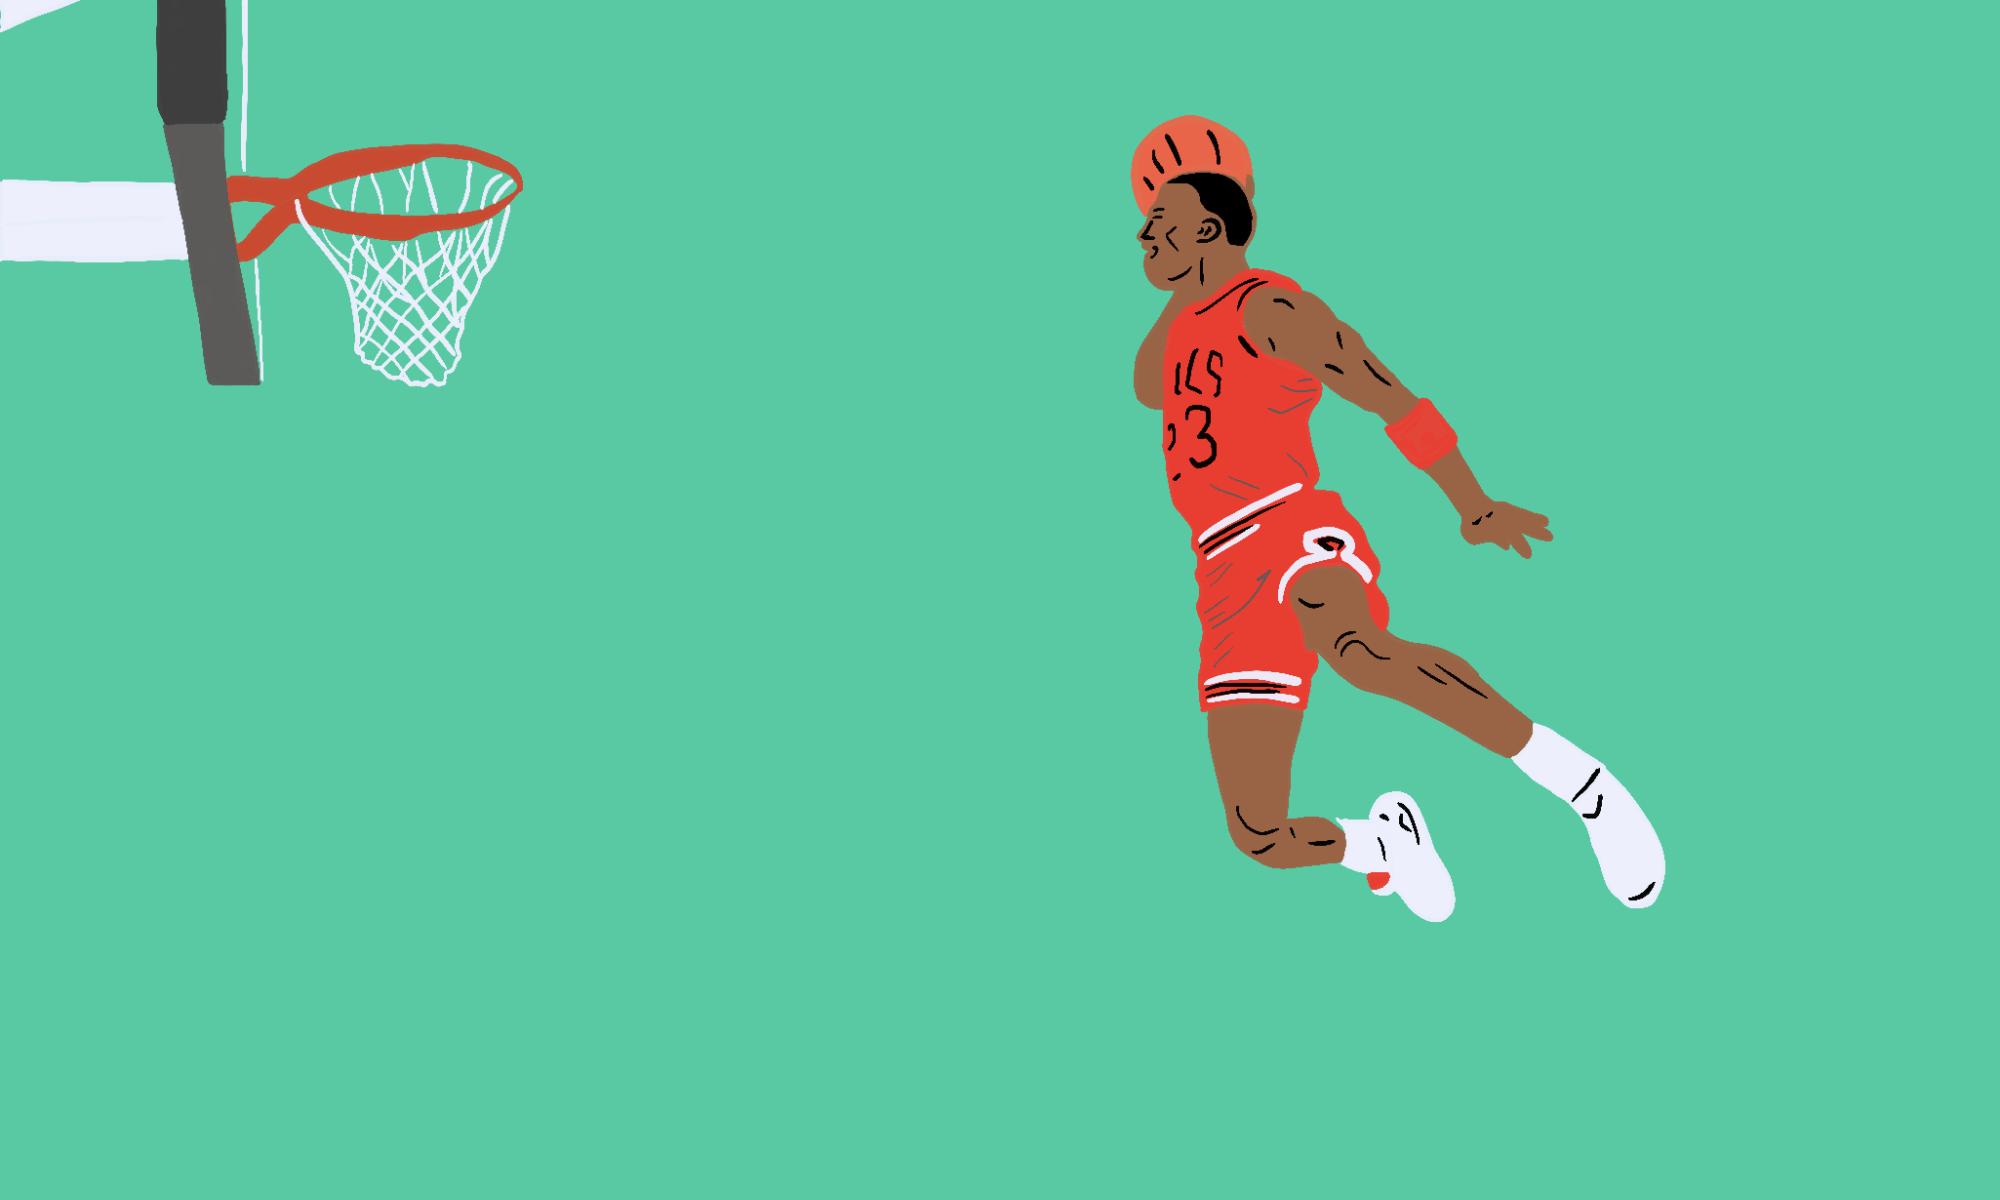 Creatives! Rise above the noise like Michael Jordan.